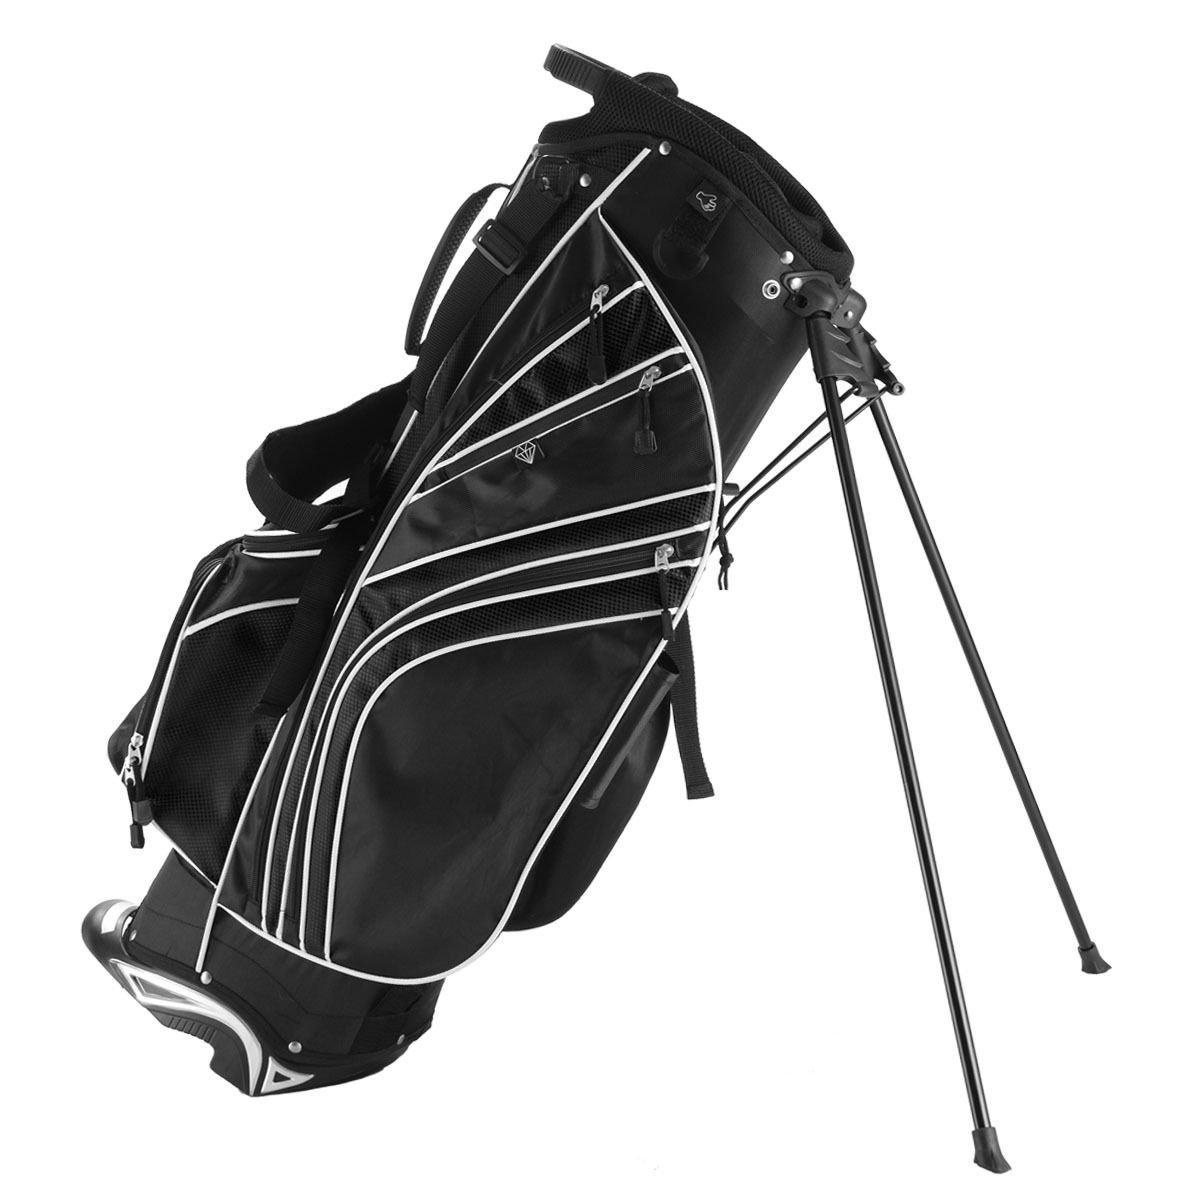 6 Way Divider Golf Stand Bag Carry OrganizerBlack